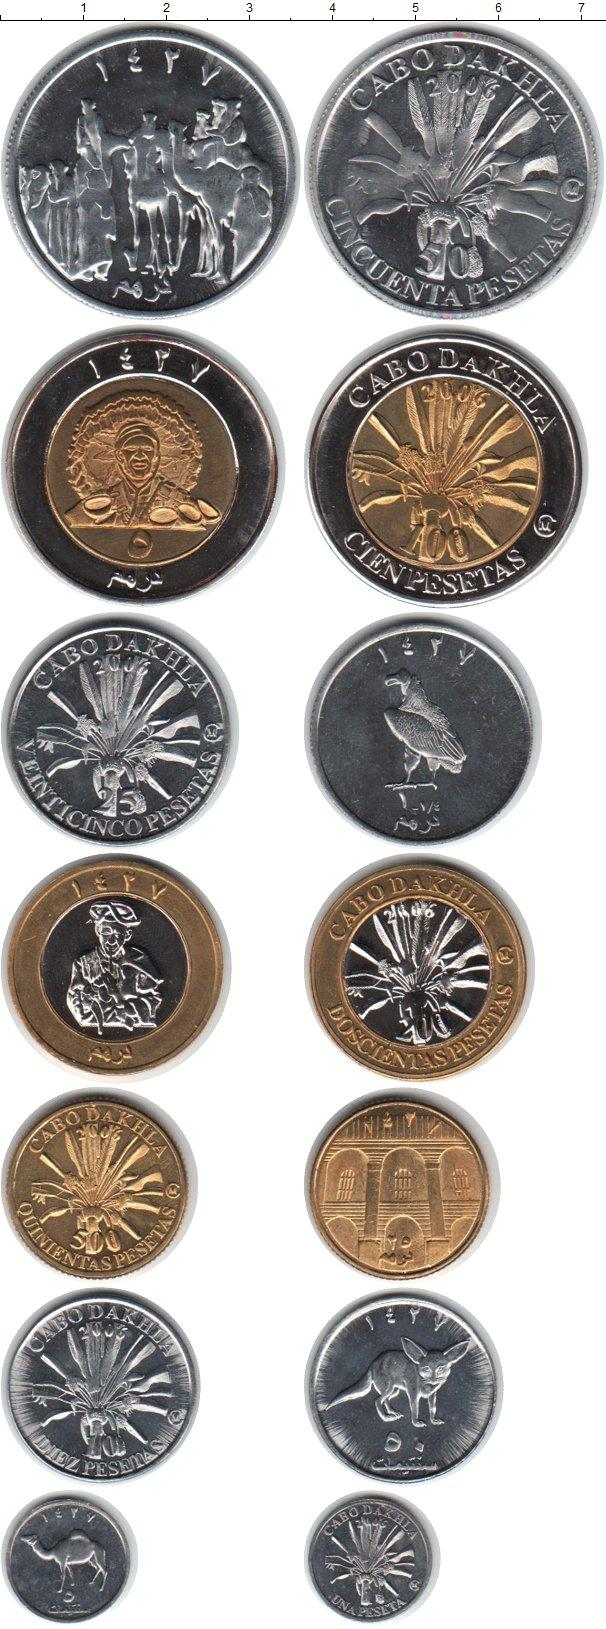 Каталог монет - Кабо Дахла Кабо Дахла 2006